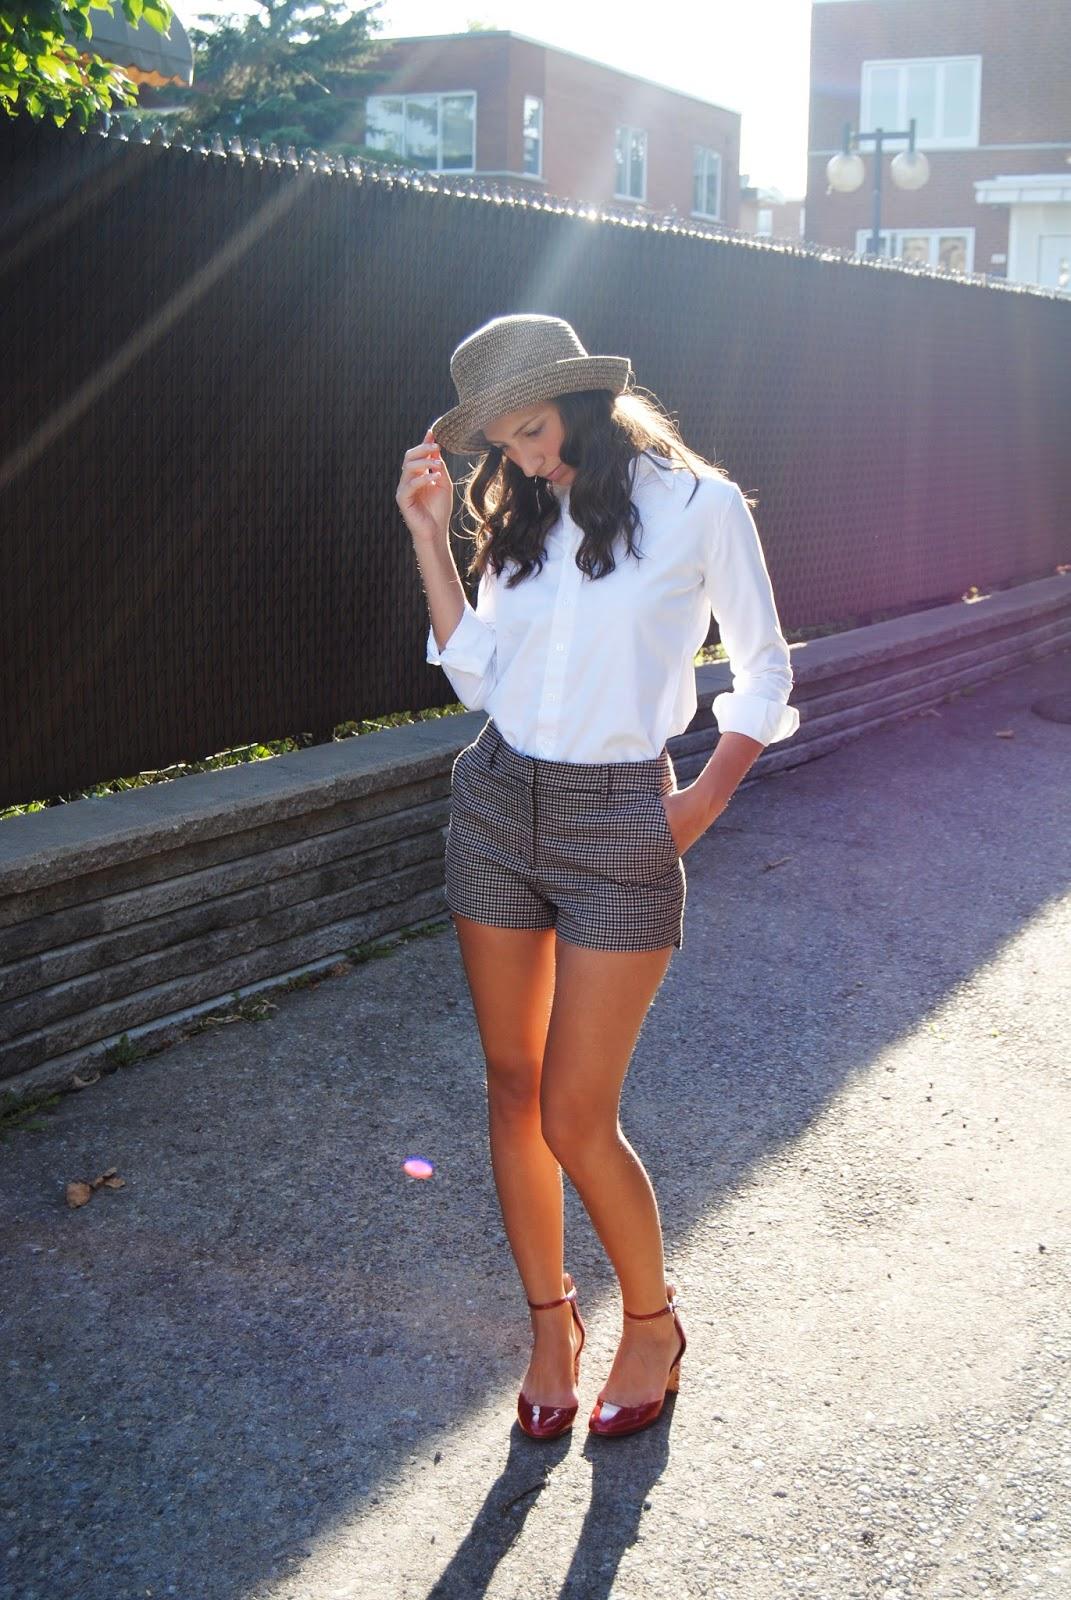 annie hall white unisex button-down shirt plaid shorts hat fall fashion red shoes